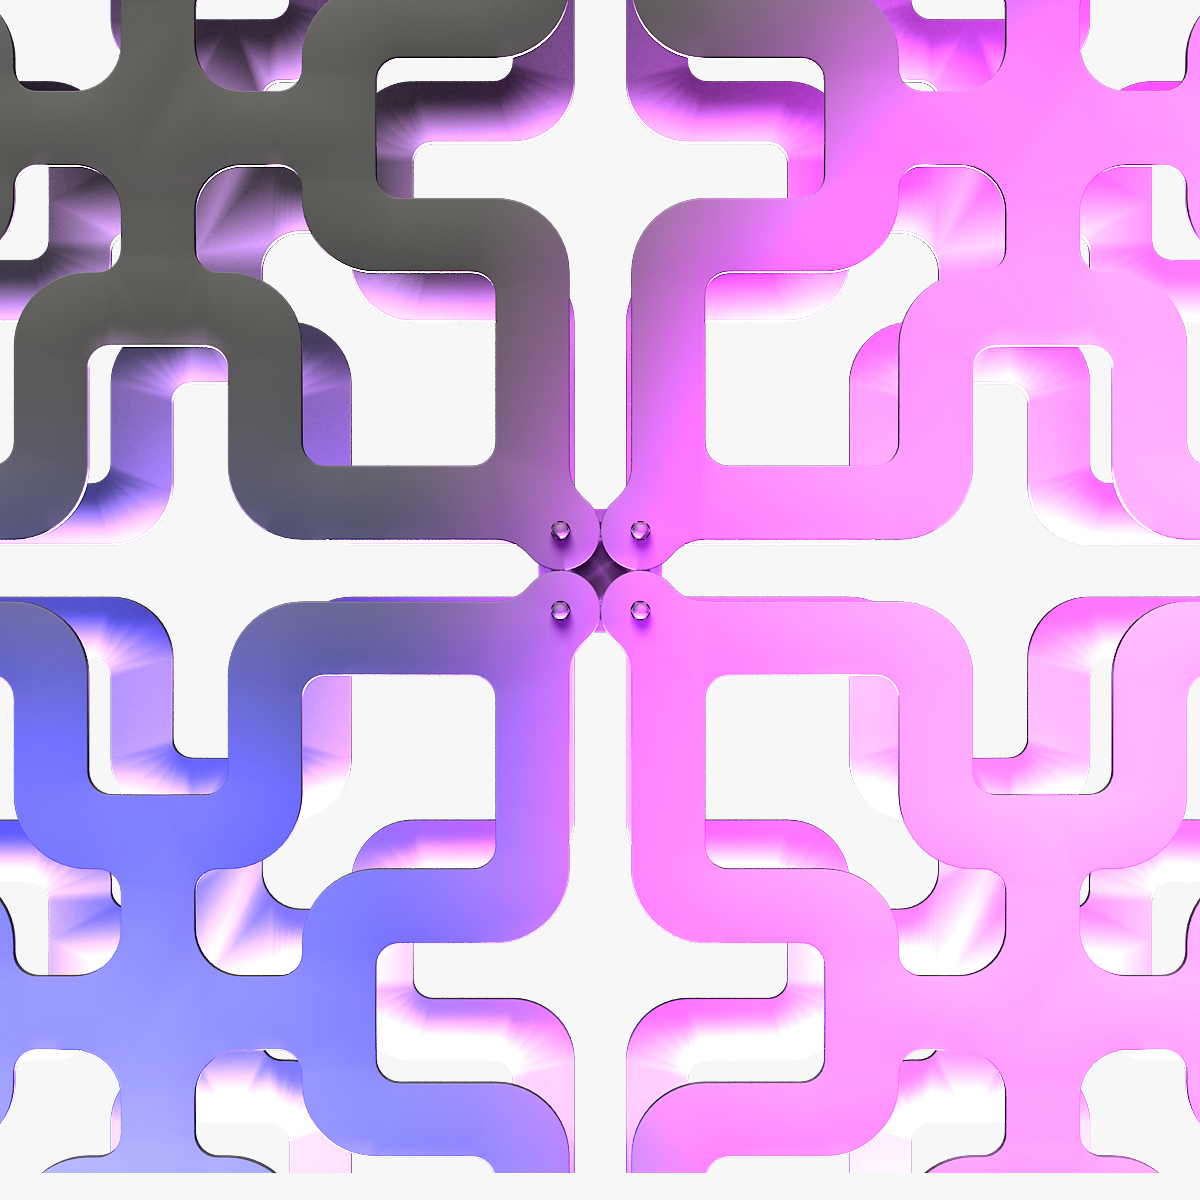 70-05-09-1200x1200.jpg Download STL file Stage Decor Collection 01 (Modular 9 Pieces) • 3D printer model, akerStudio